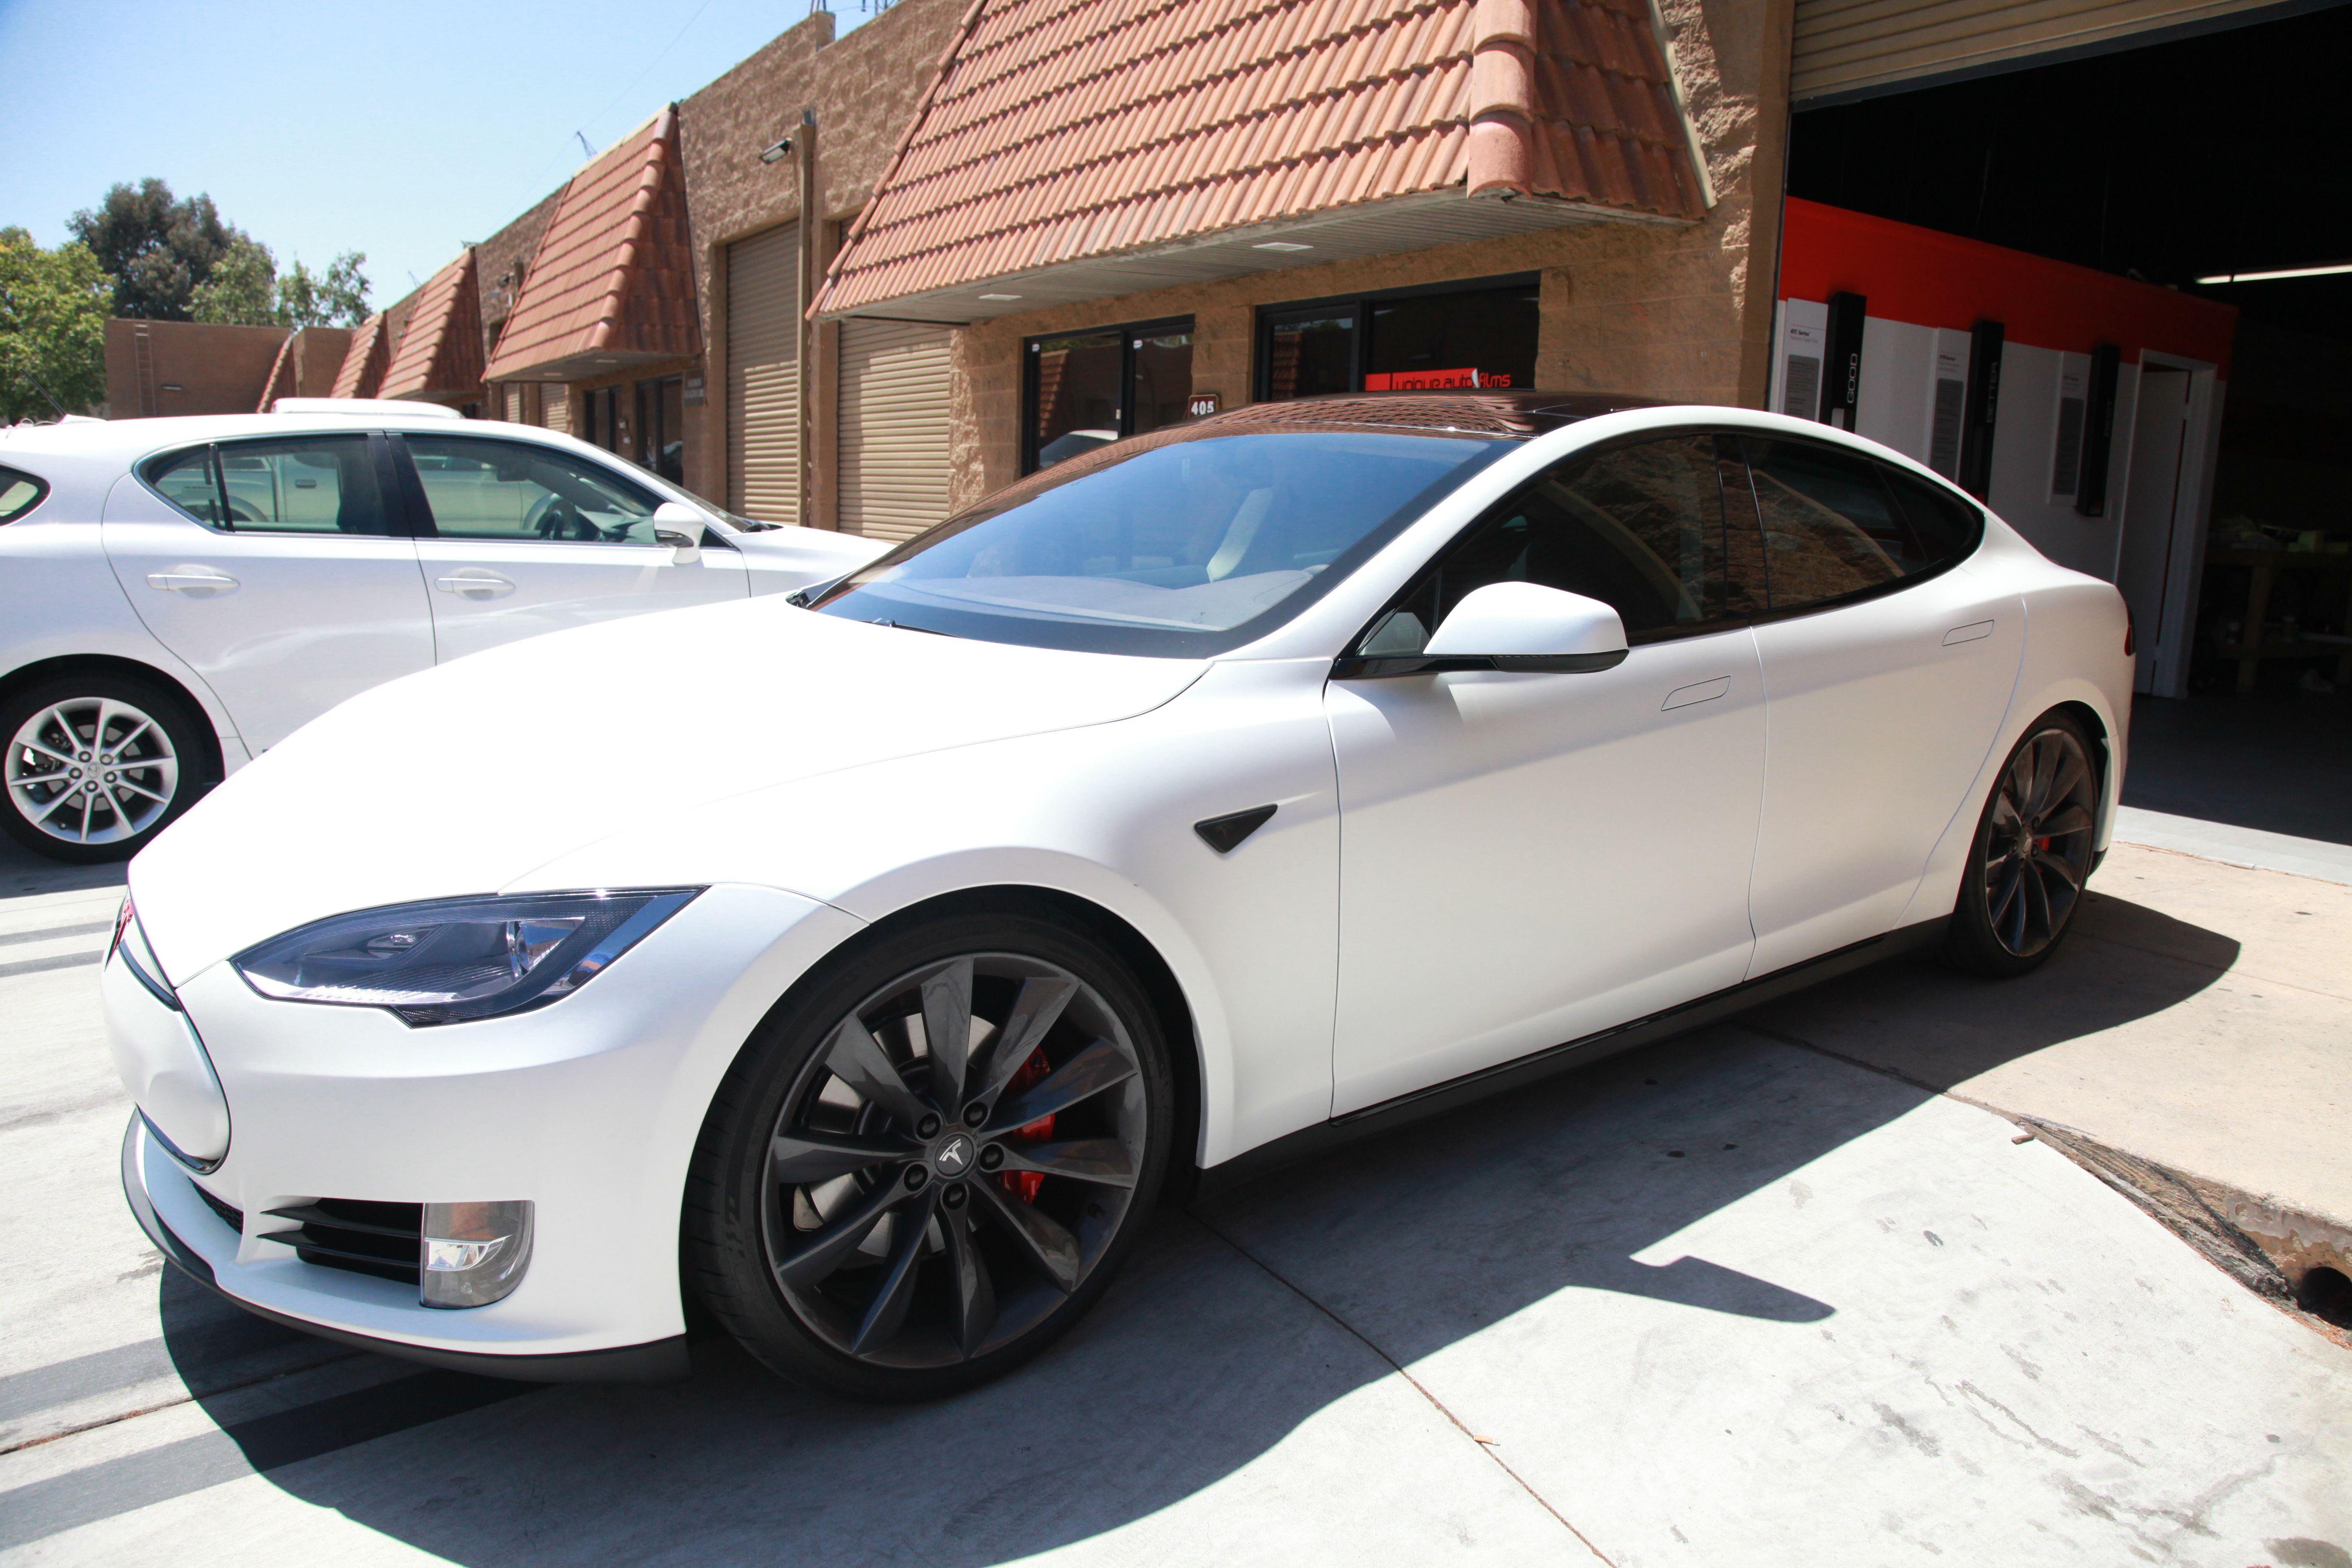 Project Tux Satin Pearl White Tesla Model S P85 Unique Auto Films Tesla Model S P85 Tesla Model S Tesla Car